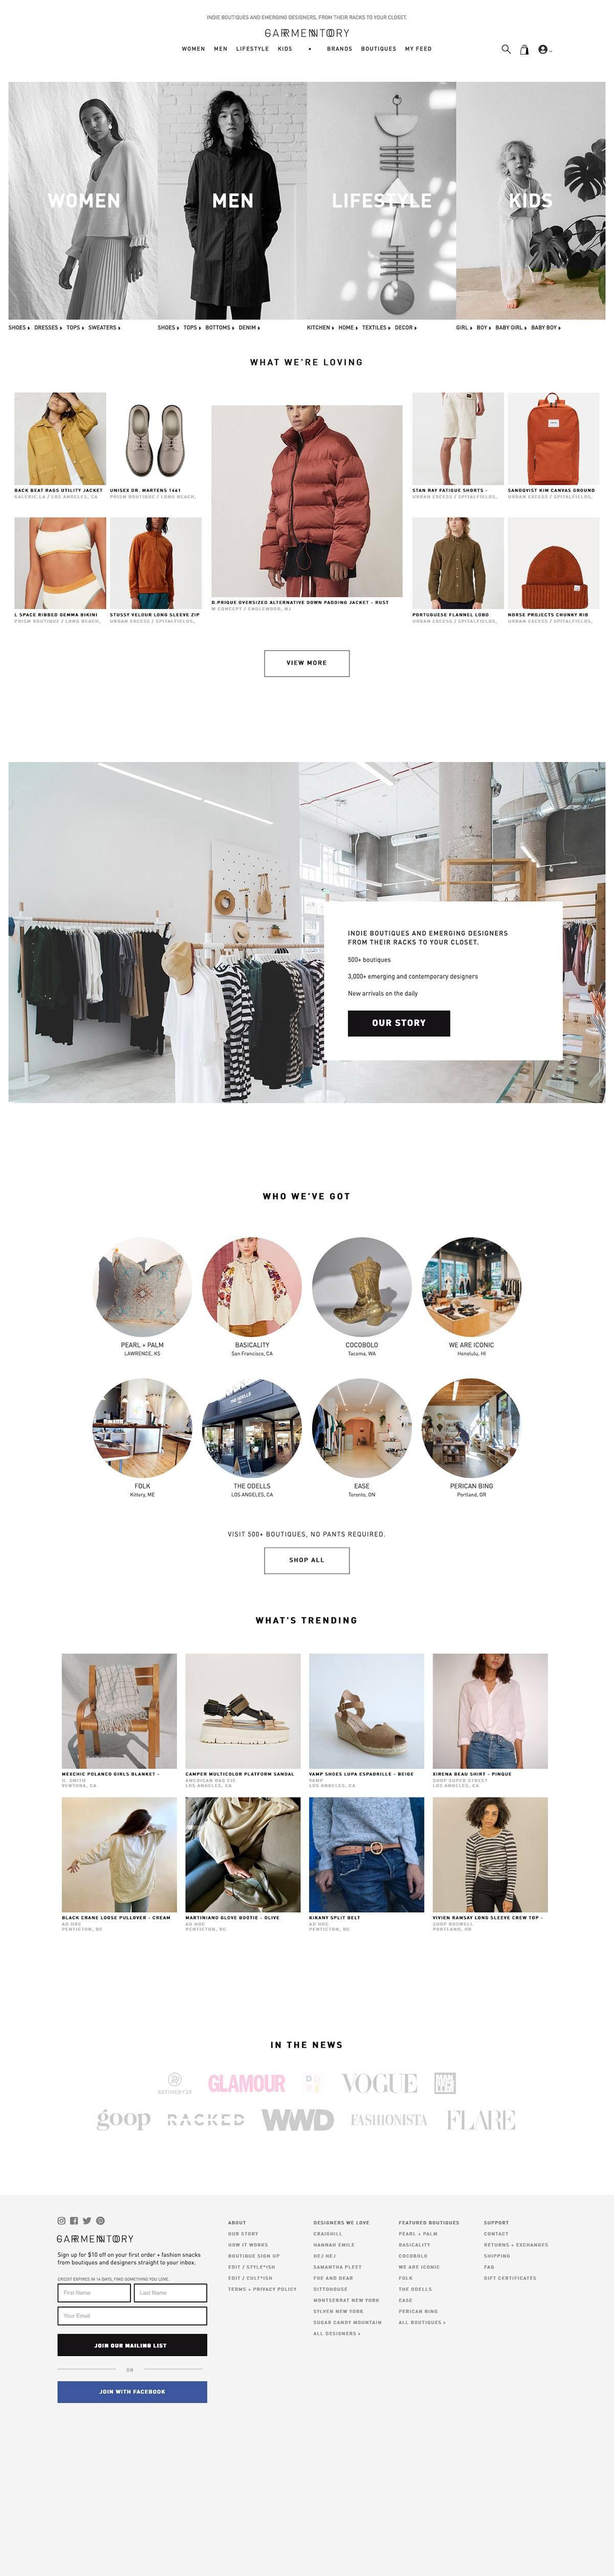 eCommerce website: Garmentory